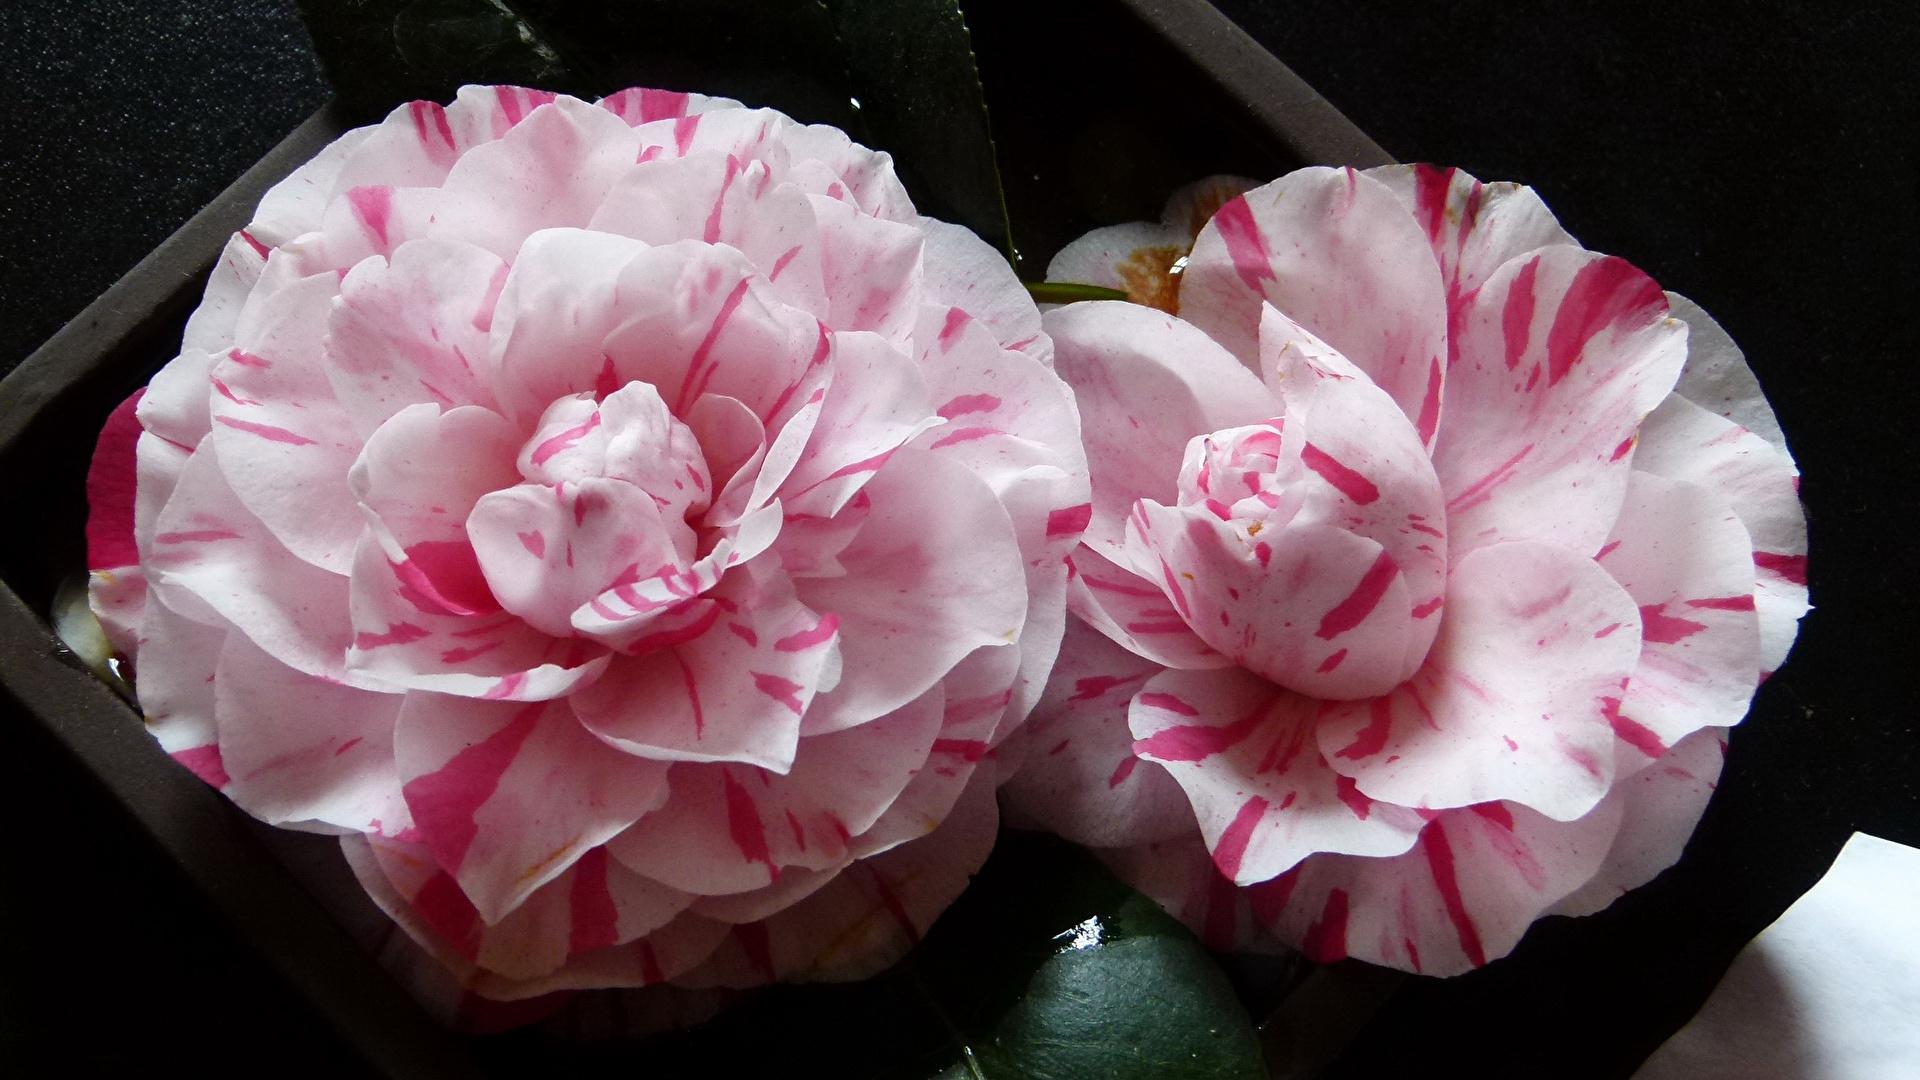 Photo Two Flower Camellia Closeup 1920x1080